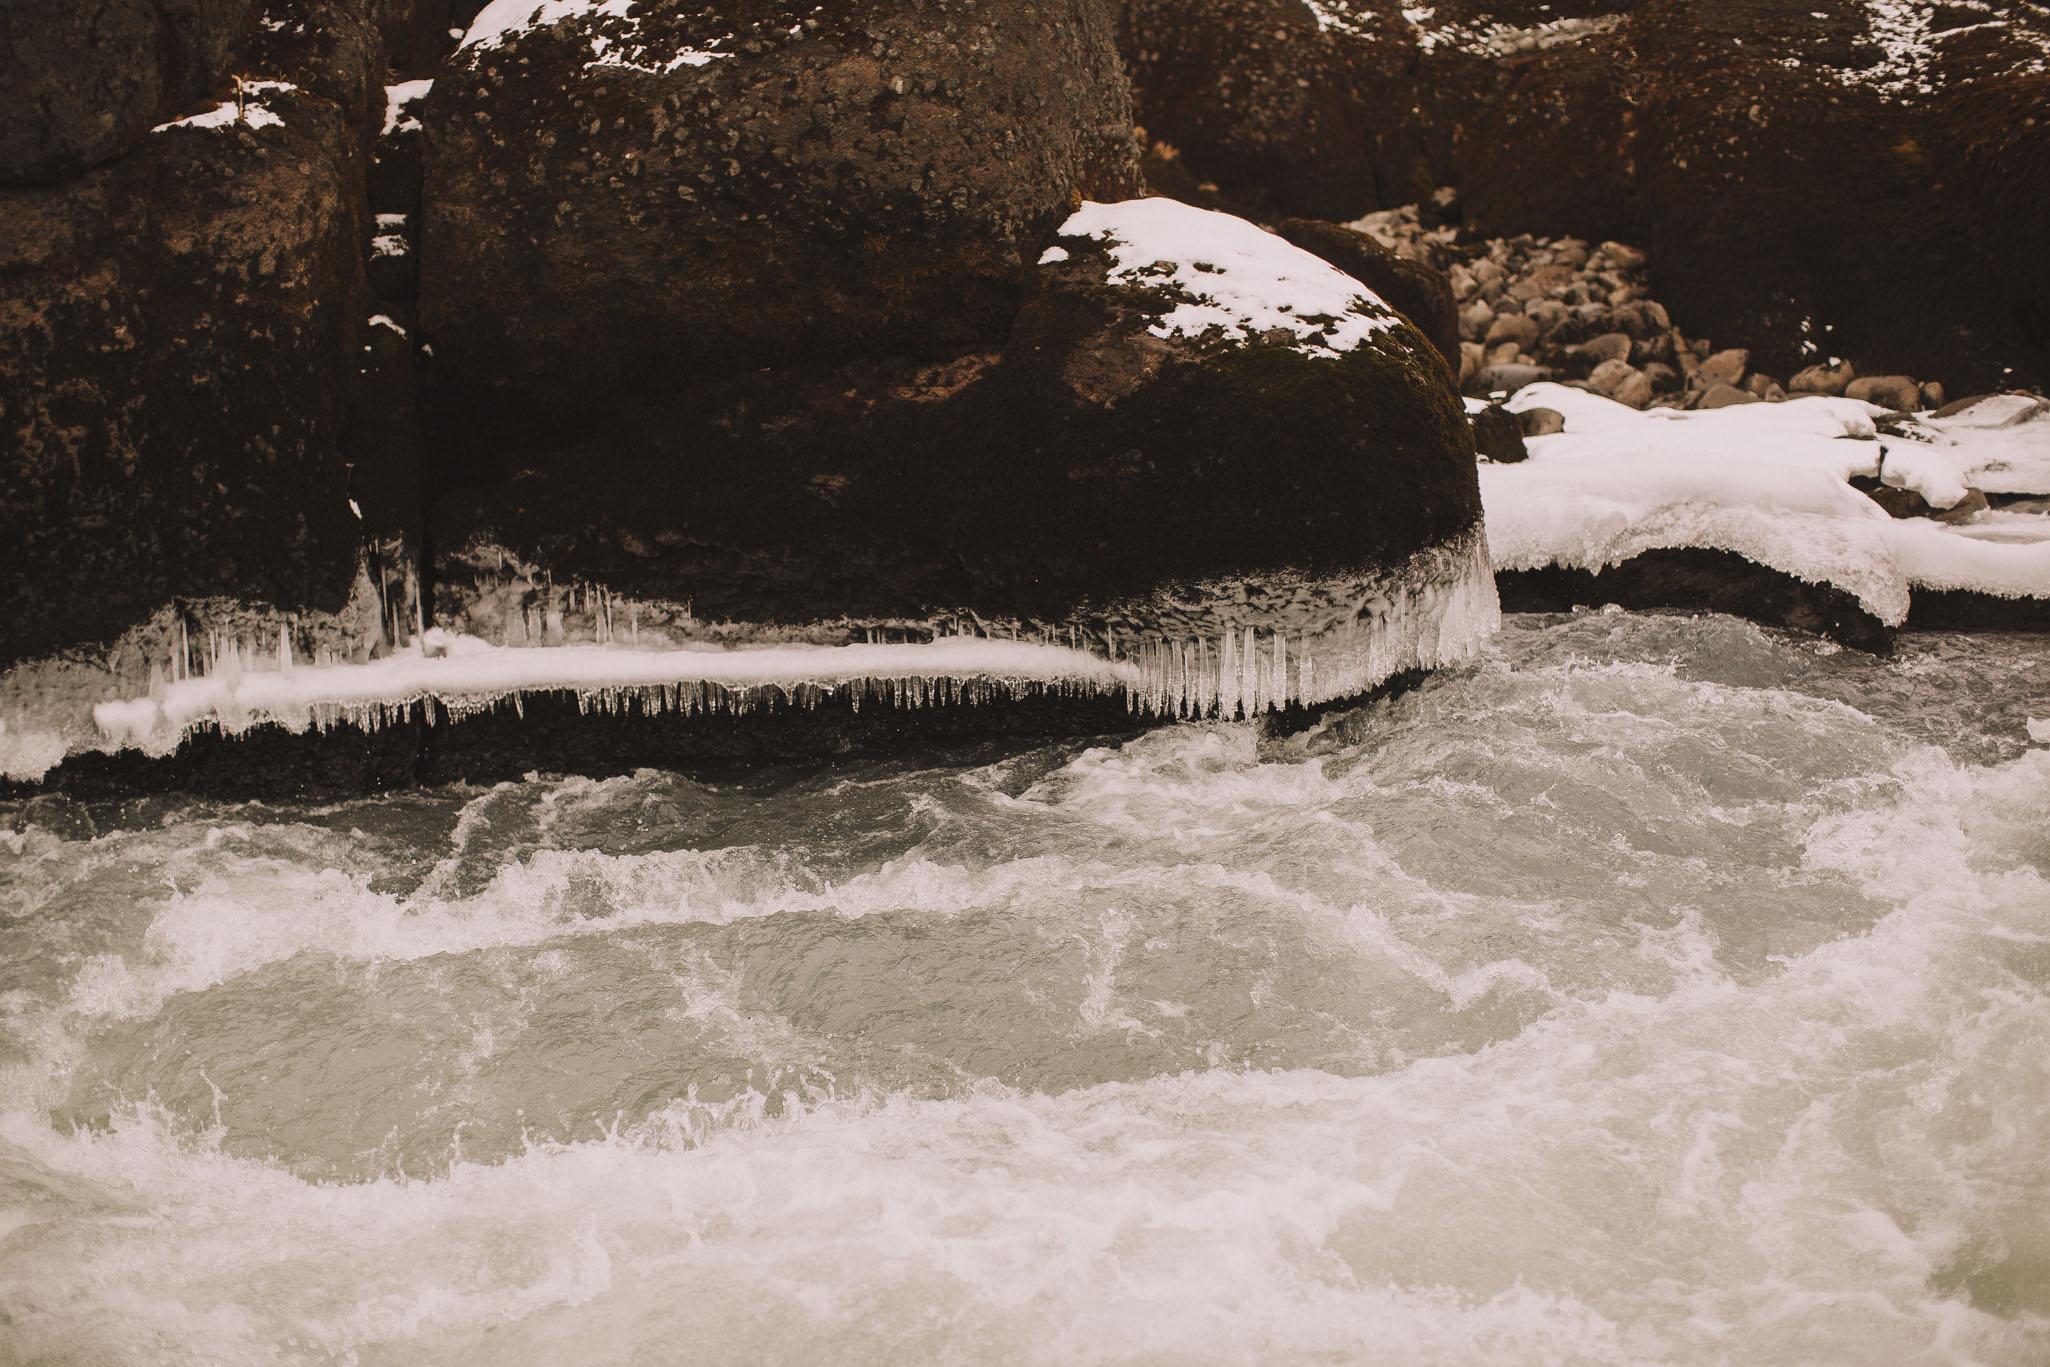 Road-trip-Islande-Iceland-Voyage-Travel-Portrait-Jérémy-Boyer-Geysir-Geysers-Horse-snow-ice-Gullfoss-25.jpg